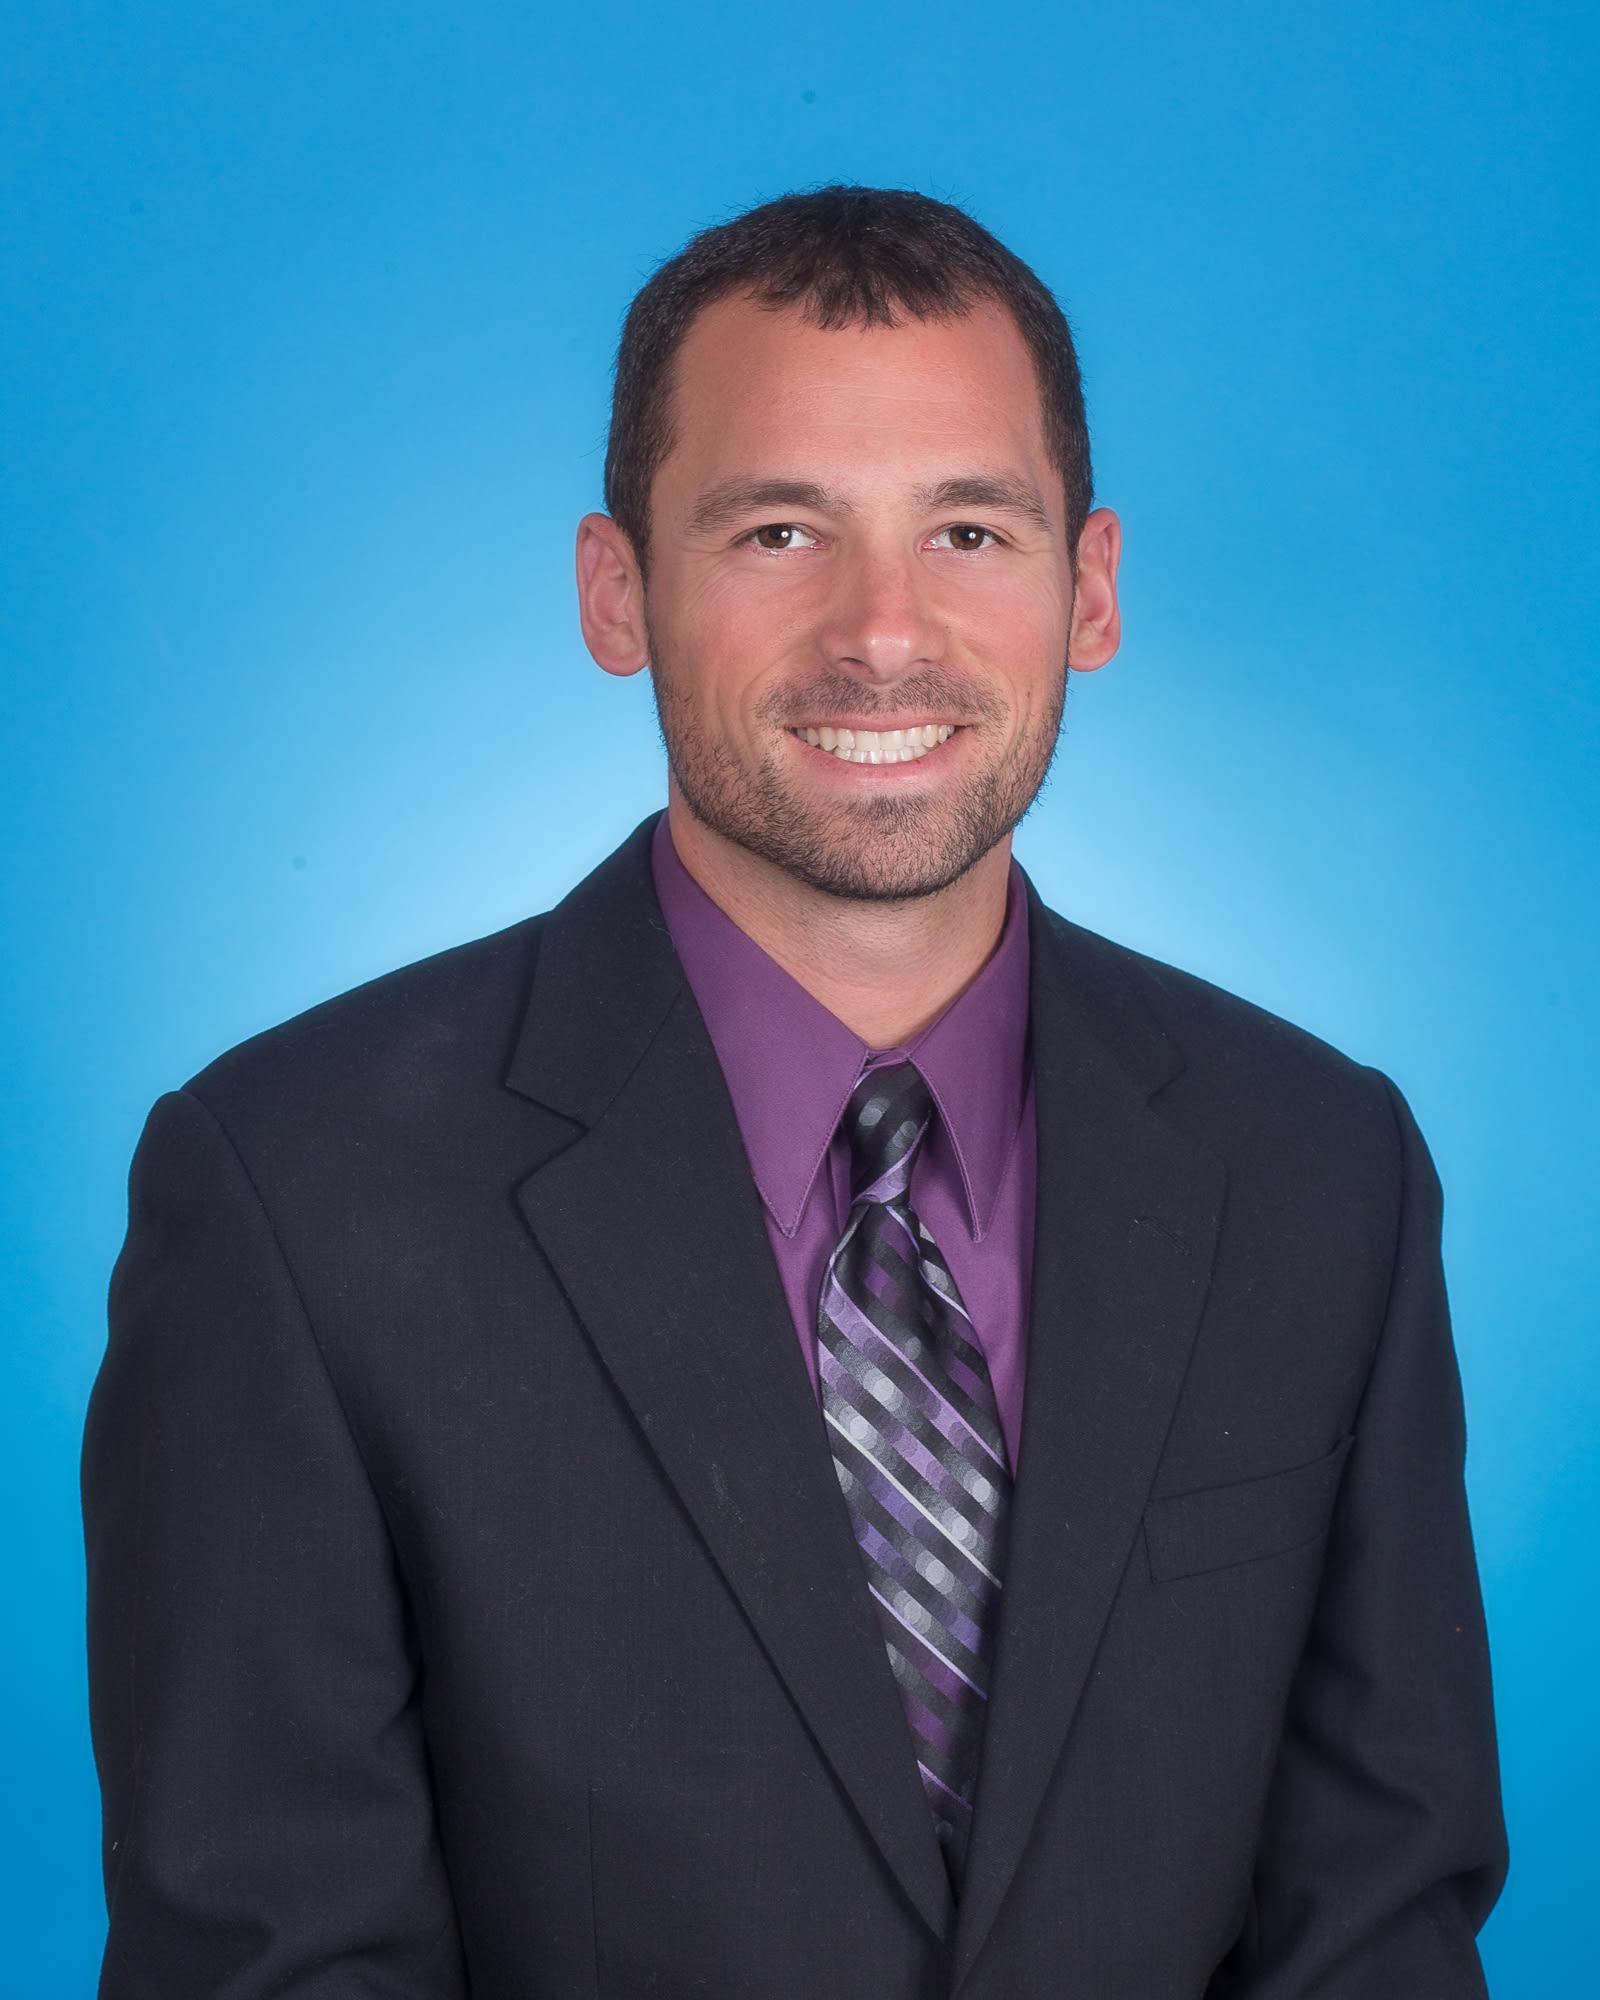 Nicholas D Keim, DC Chiropractor